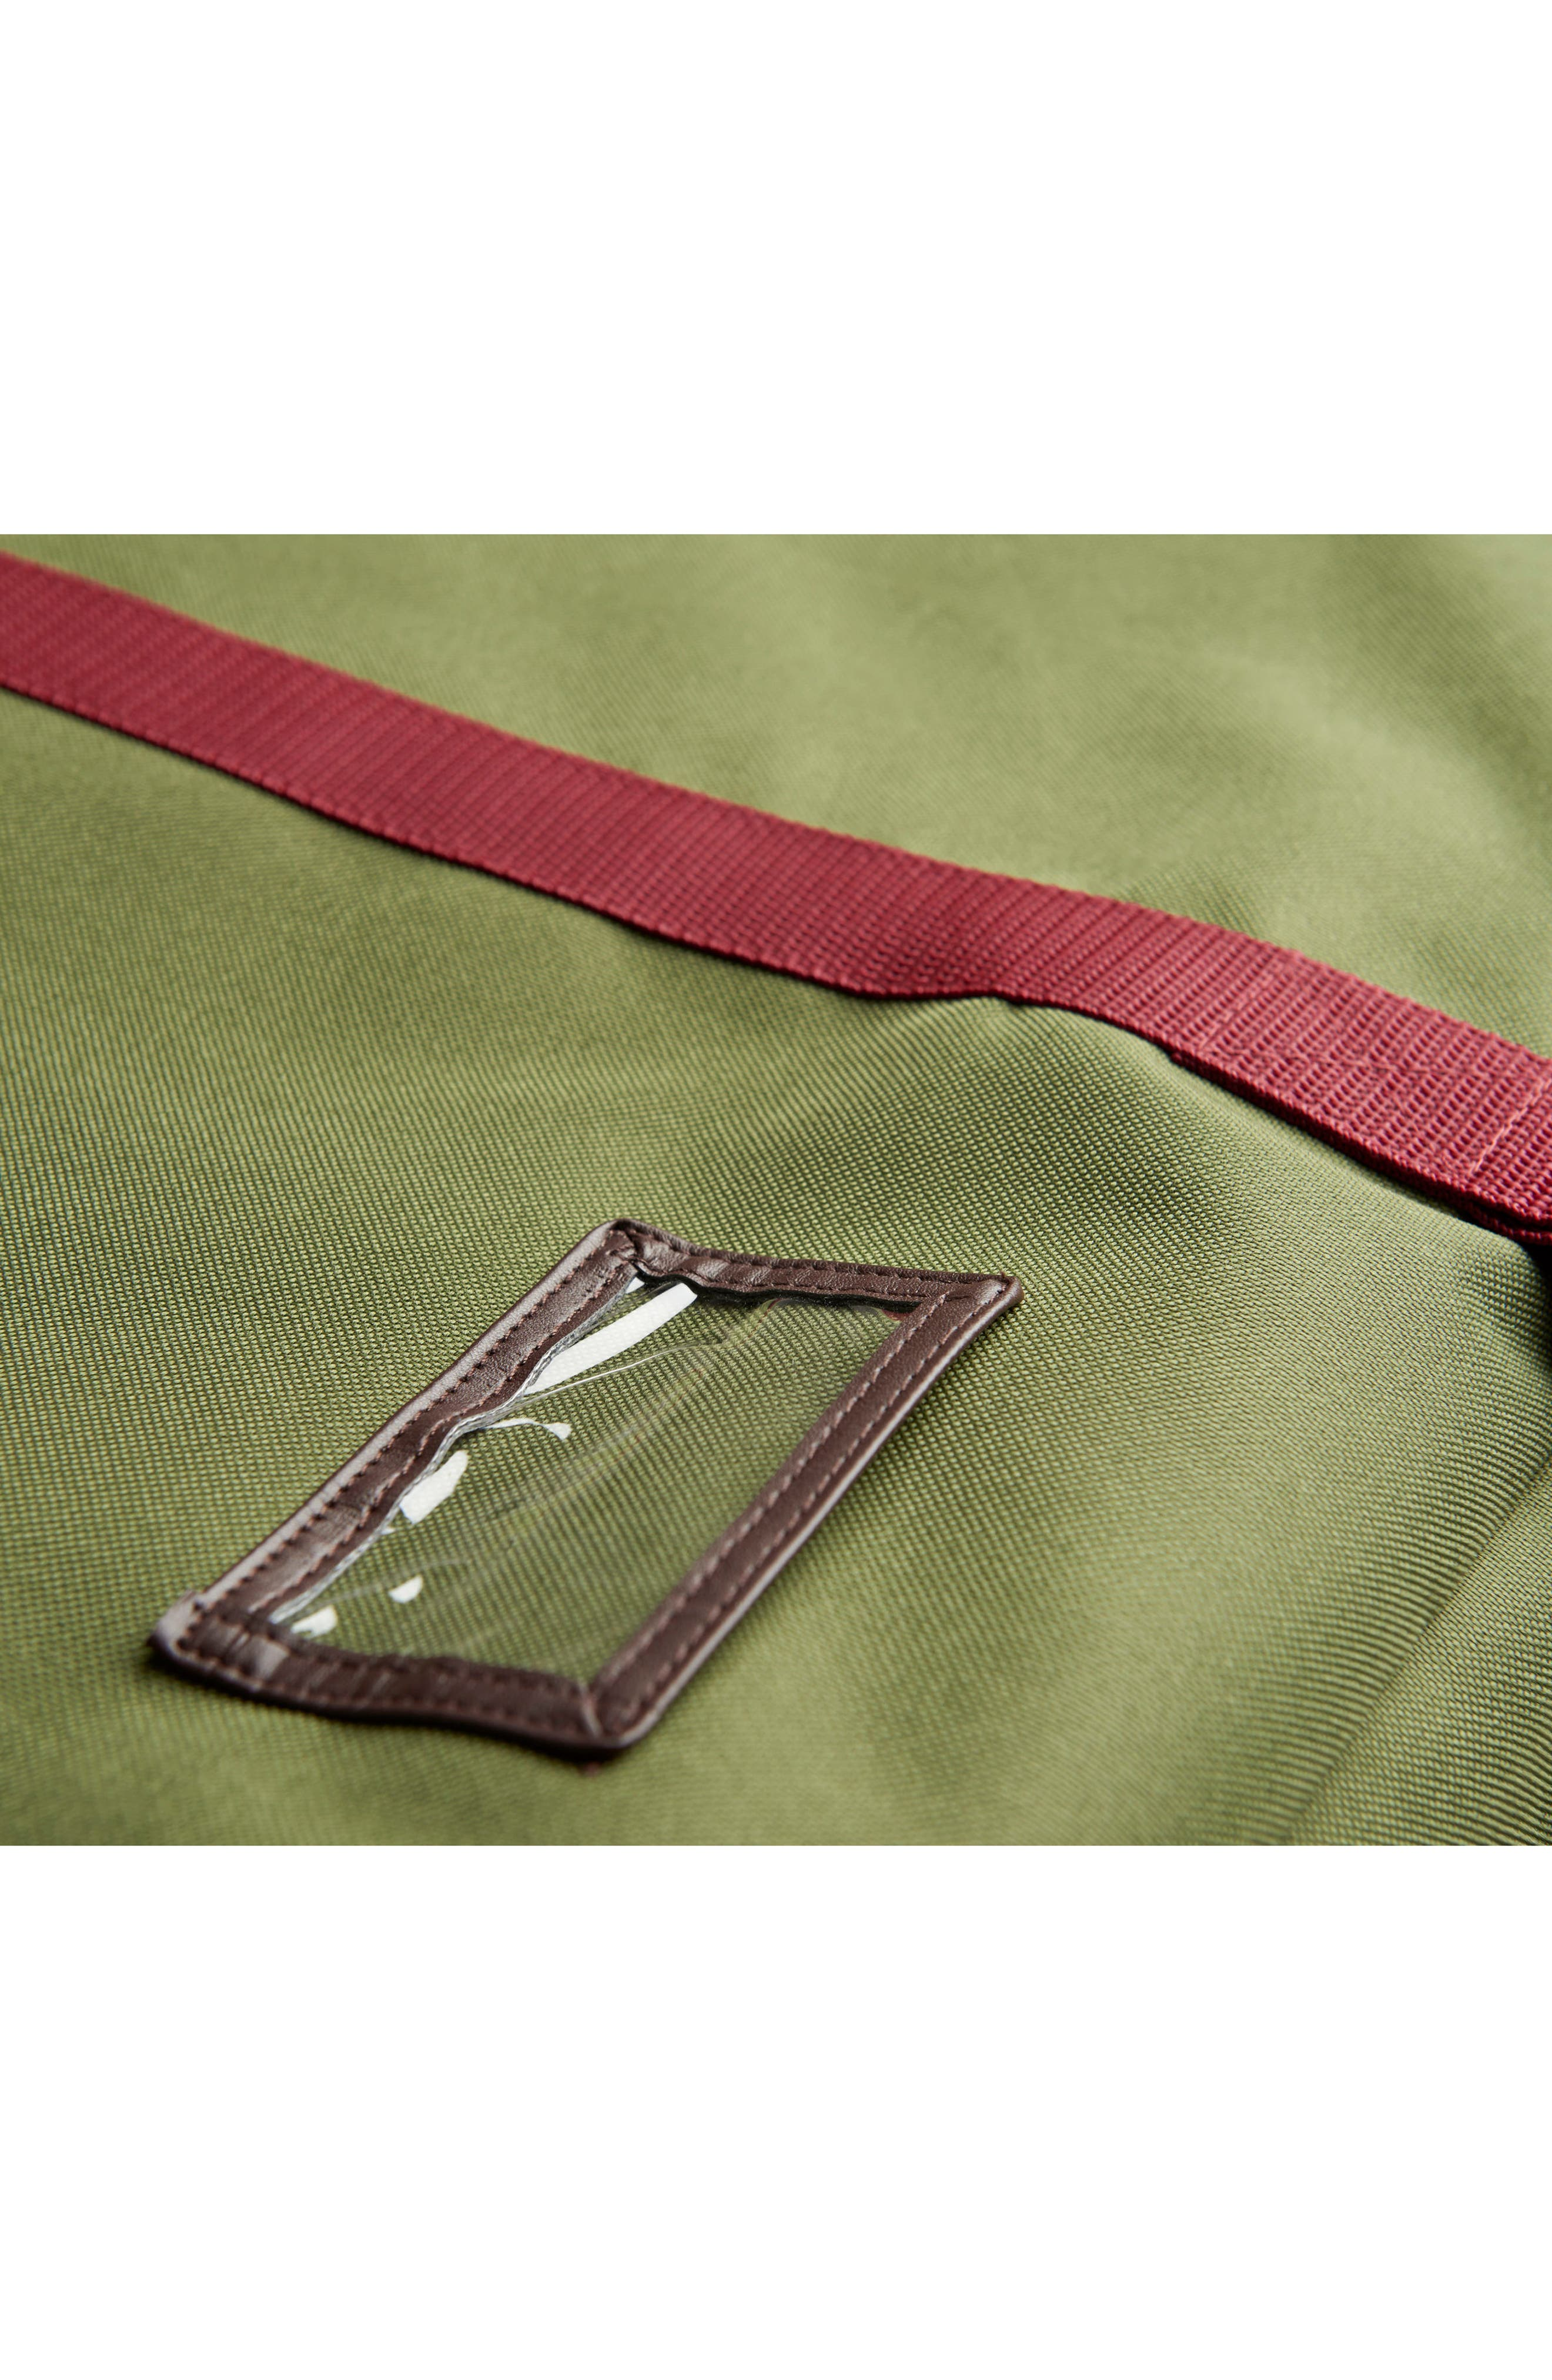 Grand Transport Bag,                             Alternate thumbnail 4, color,                             Moss Green